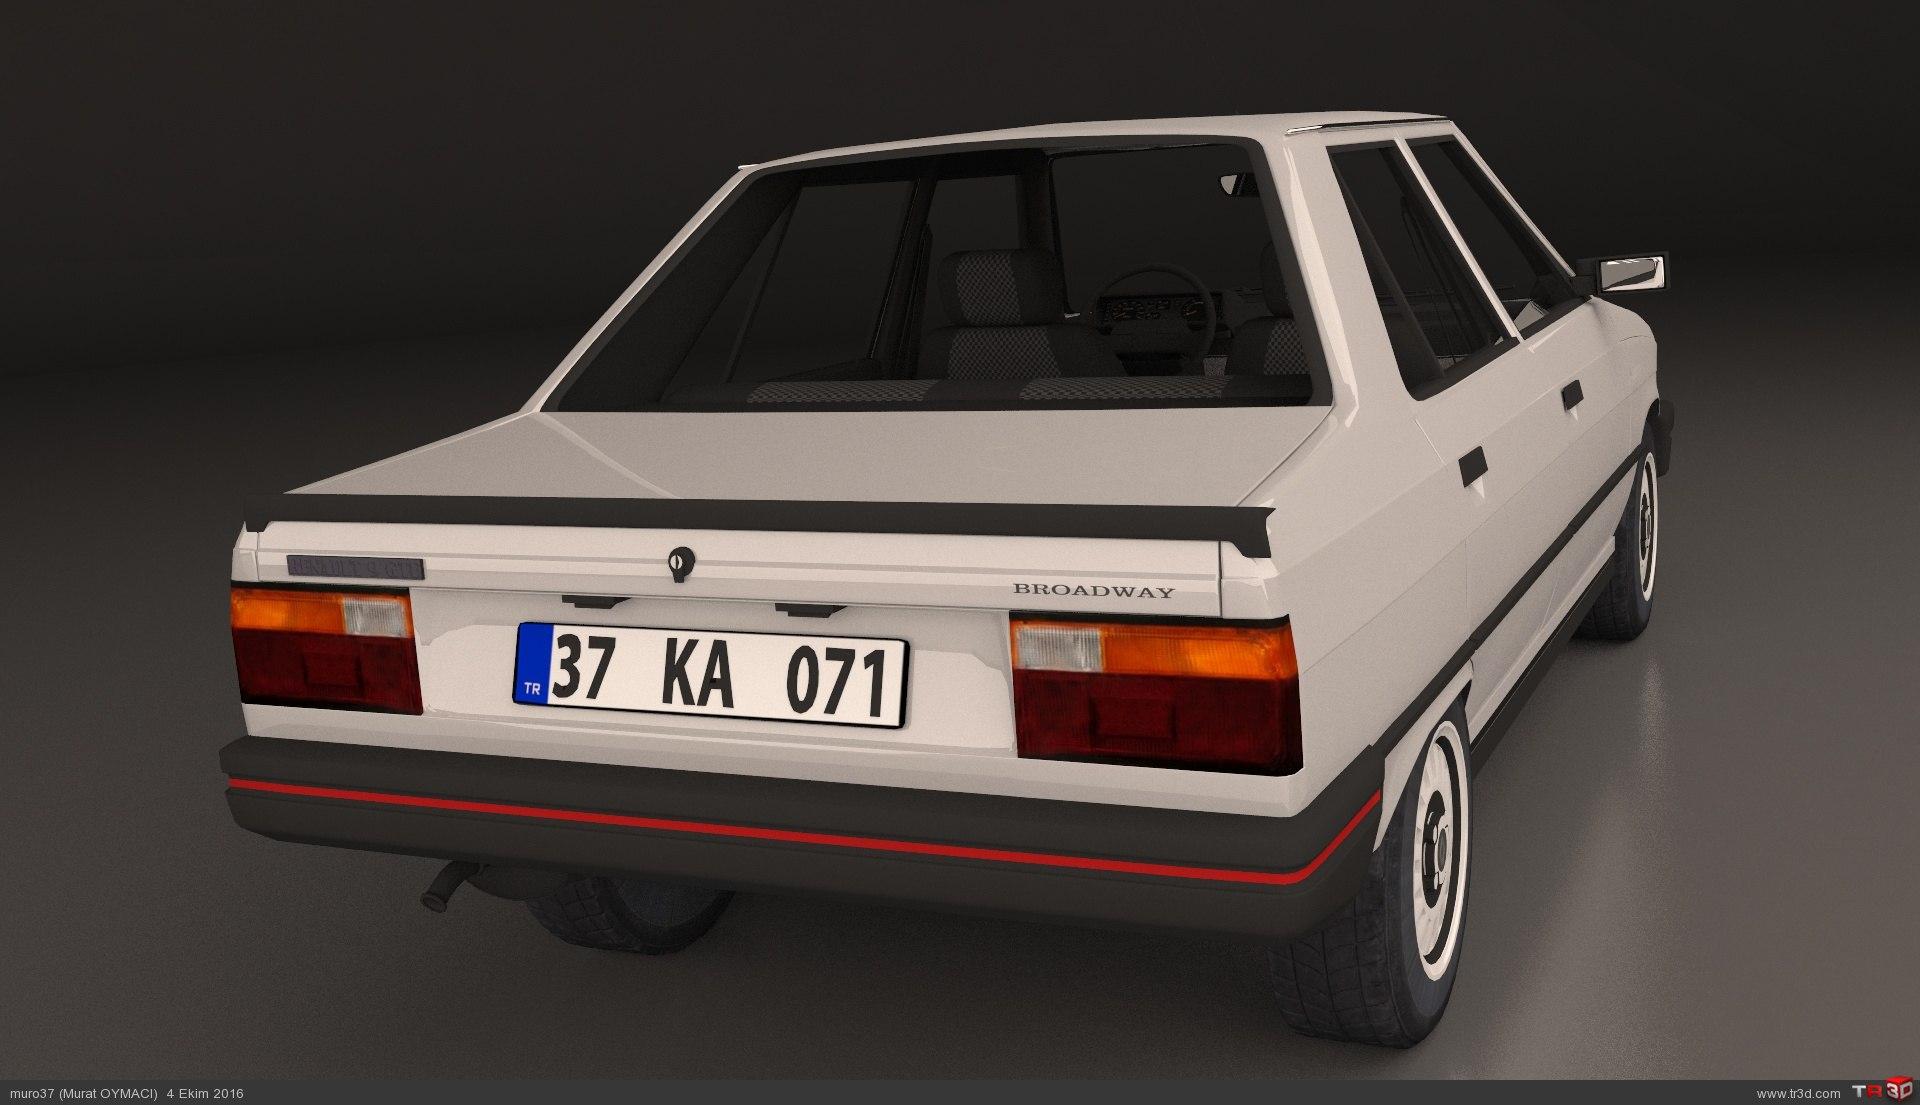 1992 Renault 9 Broadway 2